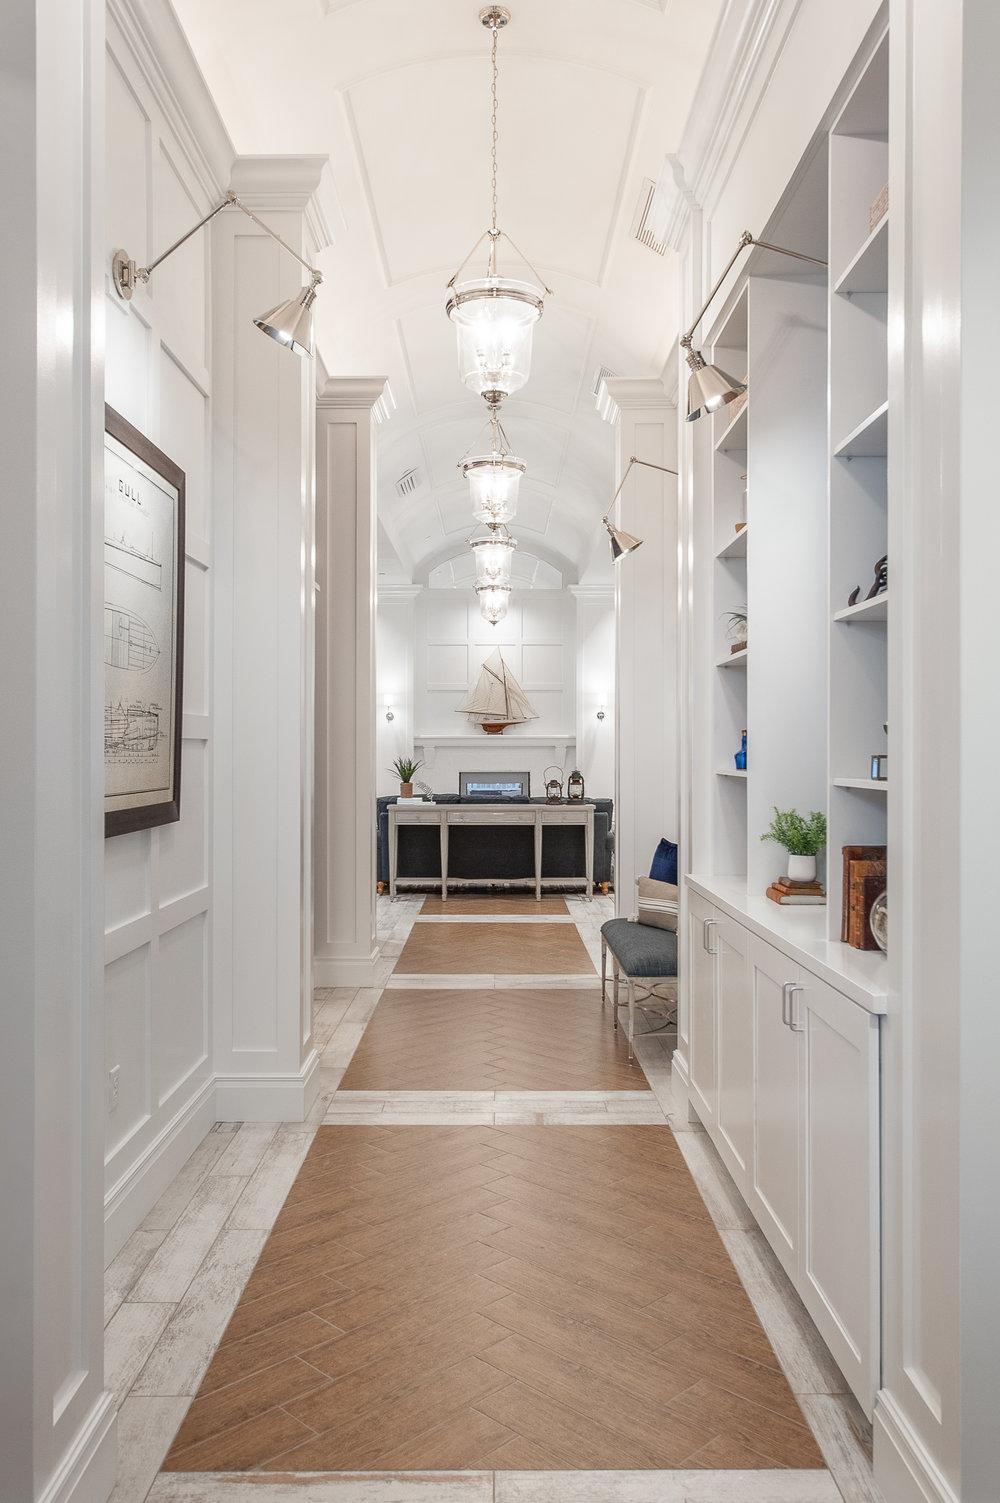 Micamy Design Studio_Interior Design_Beacon Lake_Amenity Center_Clubhouse_New England Style_Nautical_Hallway_Barrel Ceiling_Pendants_Herringbone Tile_Sconces_Ship.jpg